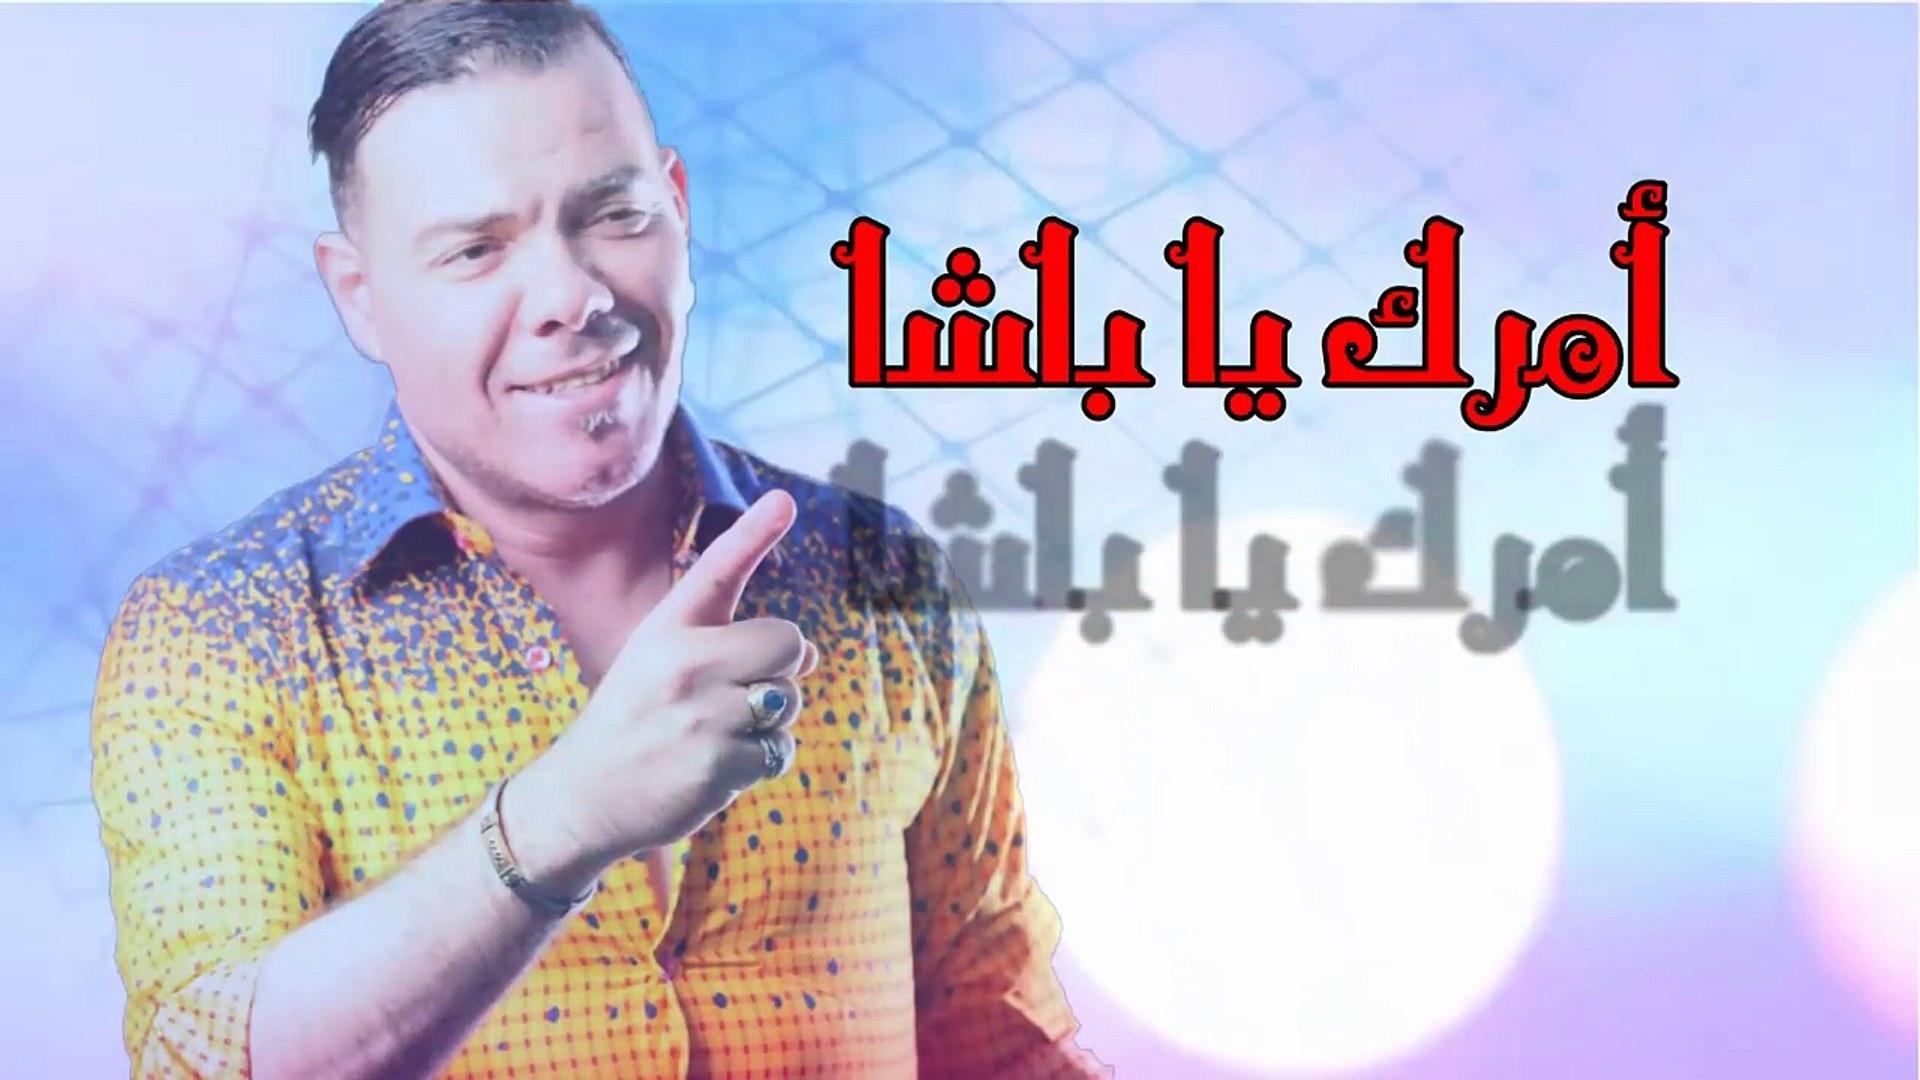 Adil El MIloudi New Single 2016 El Bacha عادل الميلودي الباشا